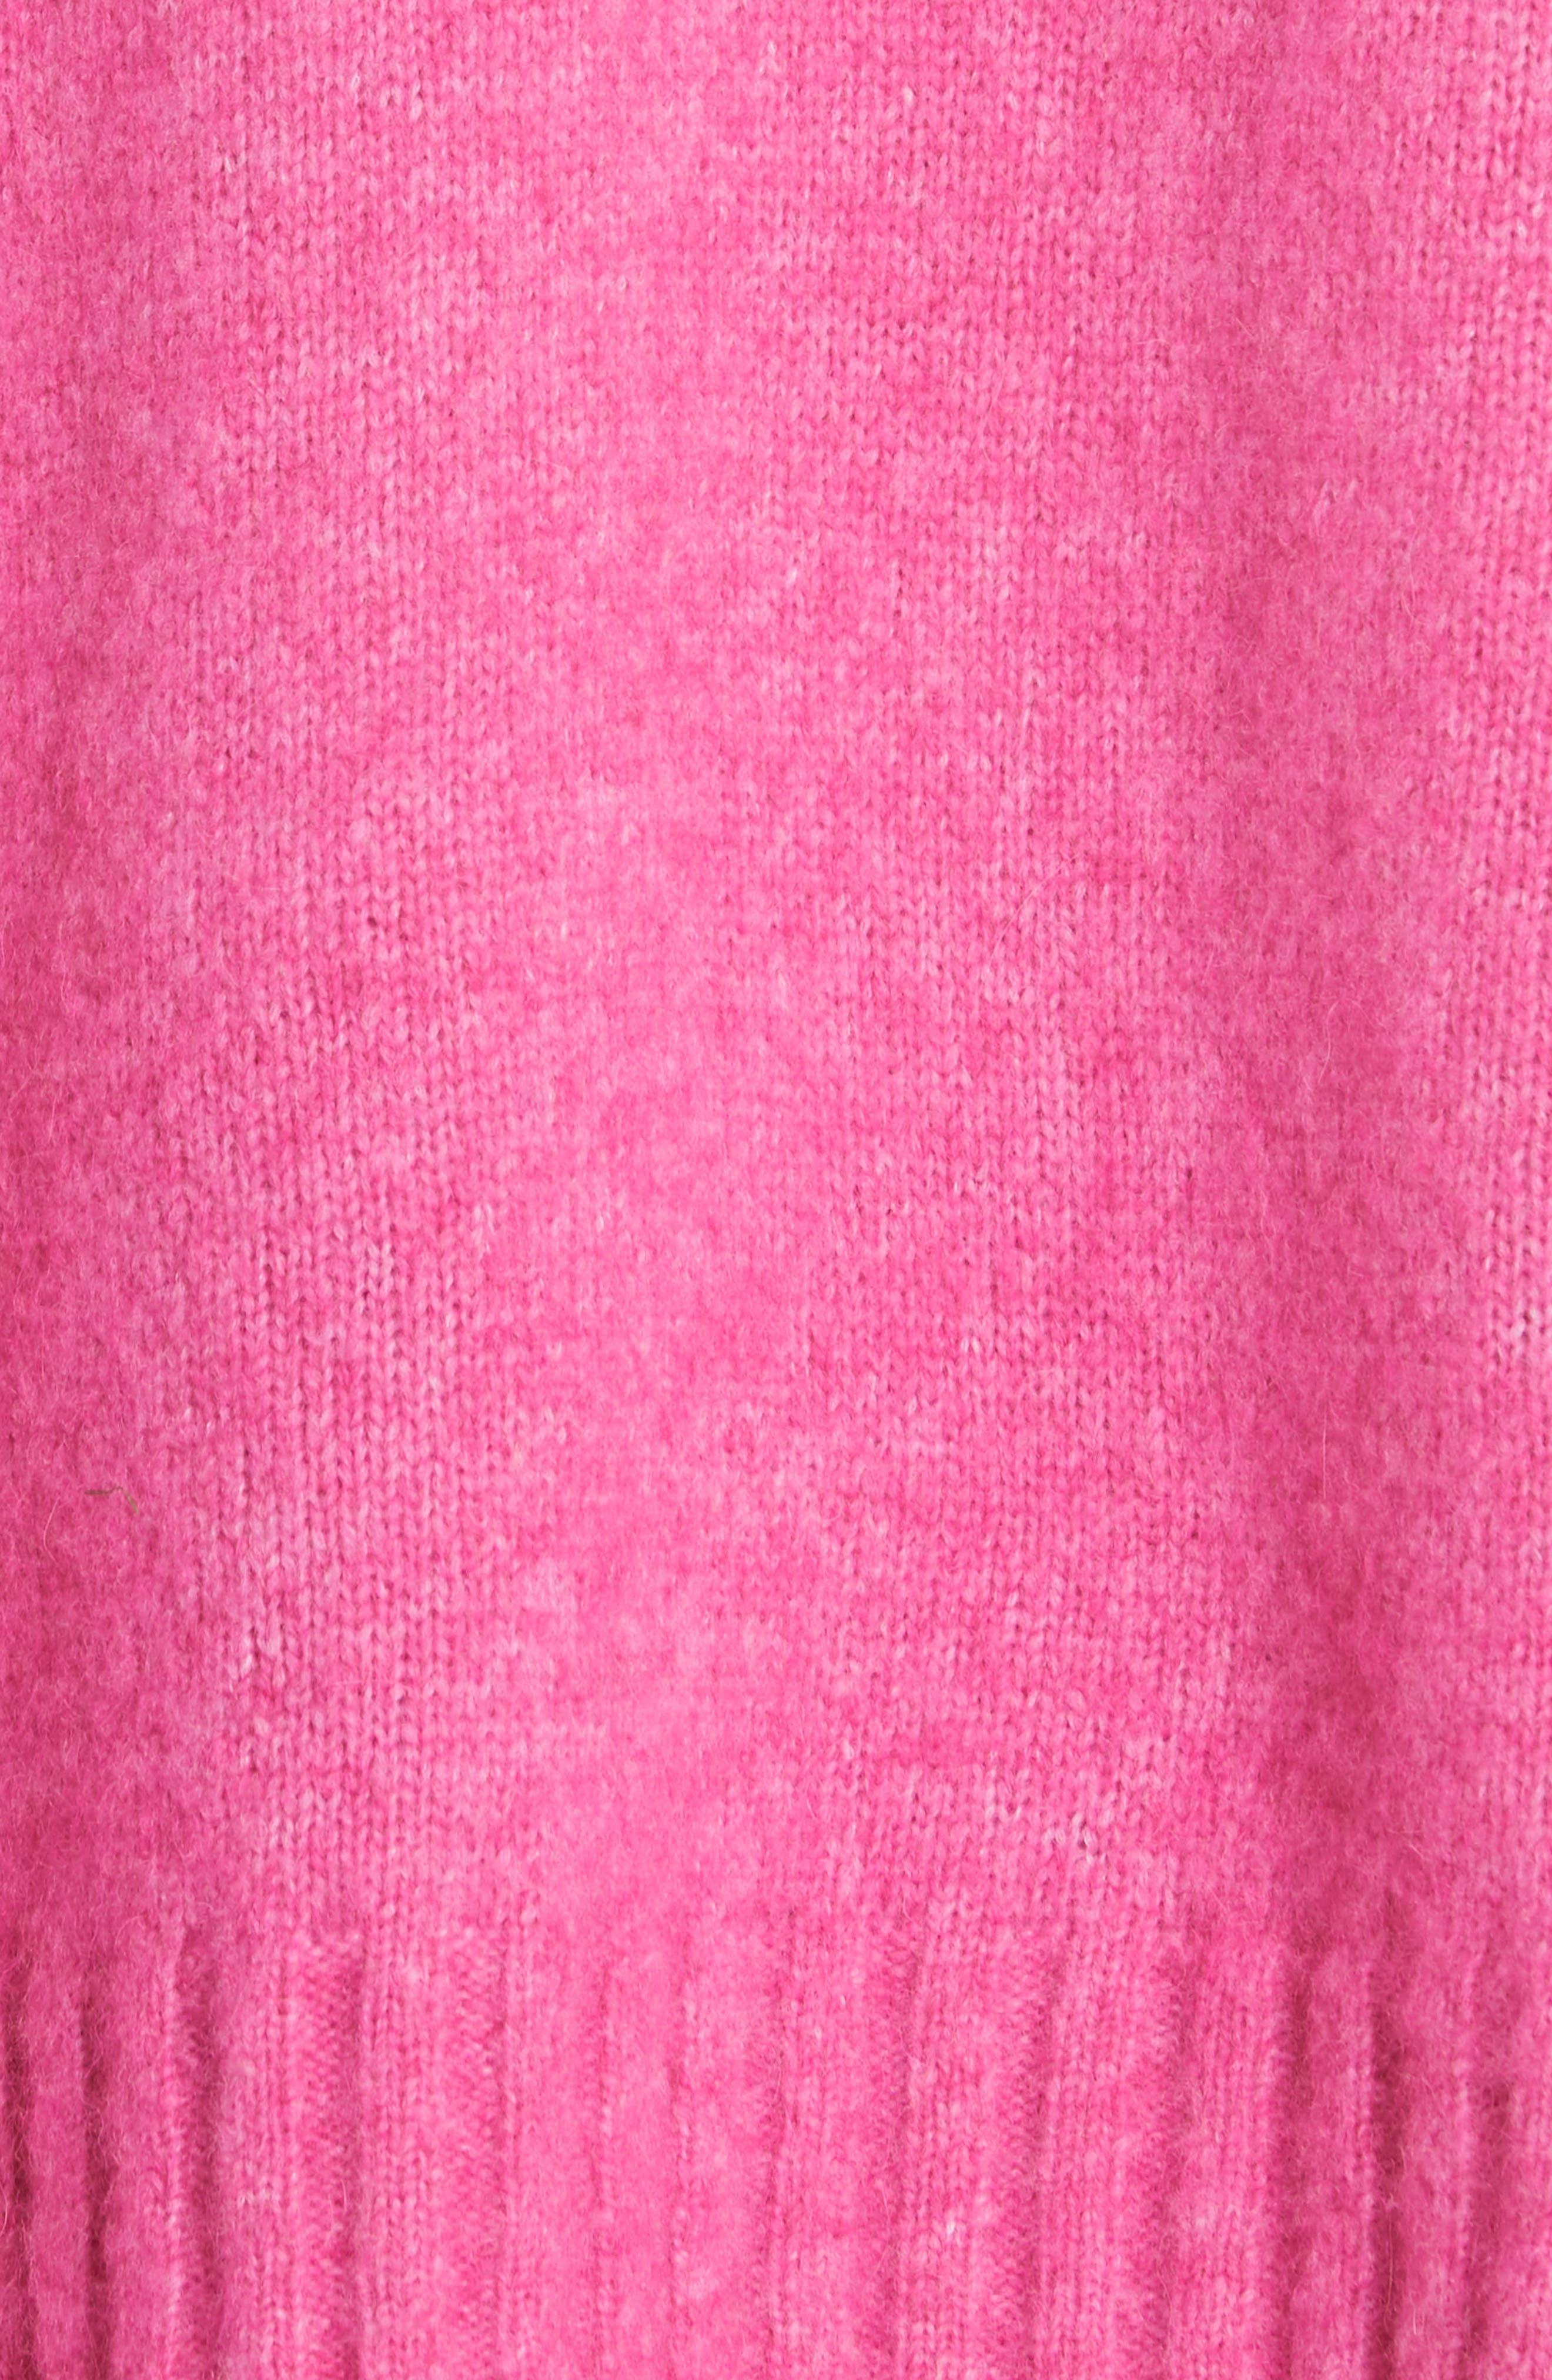 Wool & Alpaca Blend Sweater,                             Alternate thumbnail 5, color,                             653